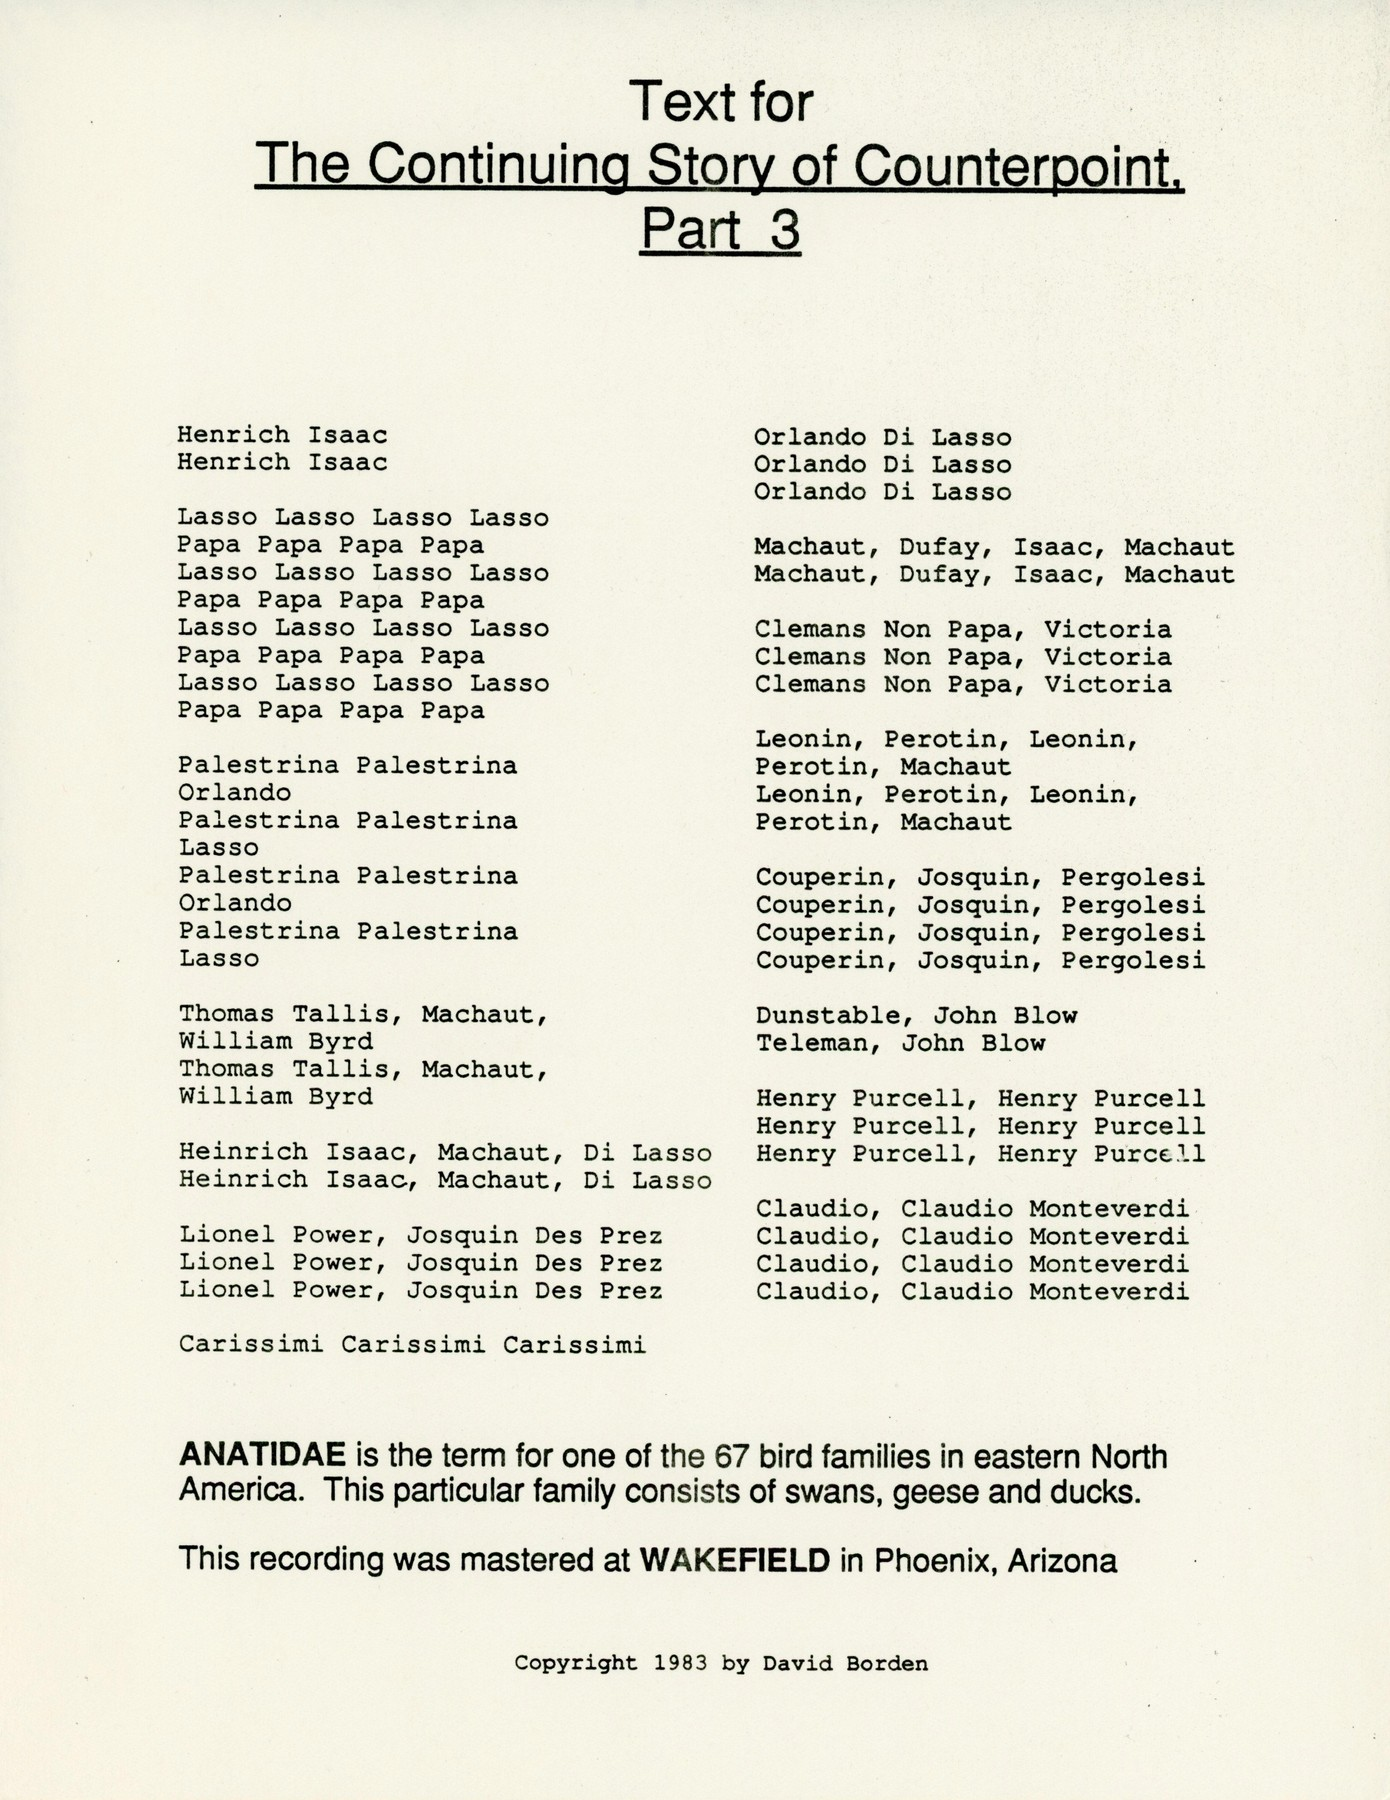 David Borden and the New Mother Mallard Band - Anatidae LP Insert